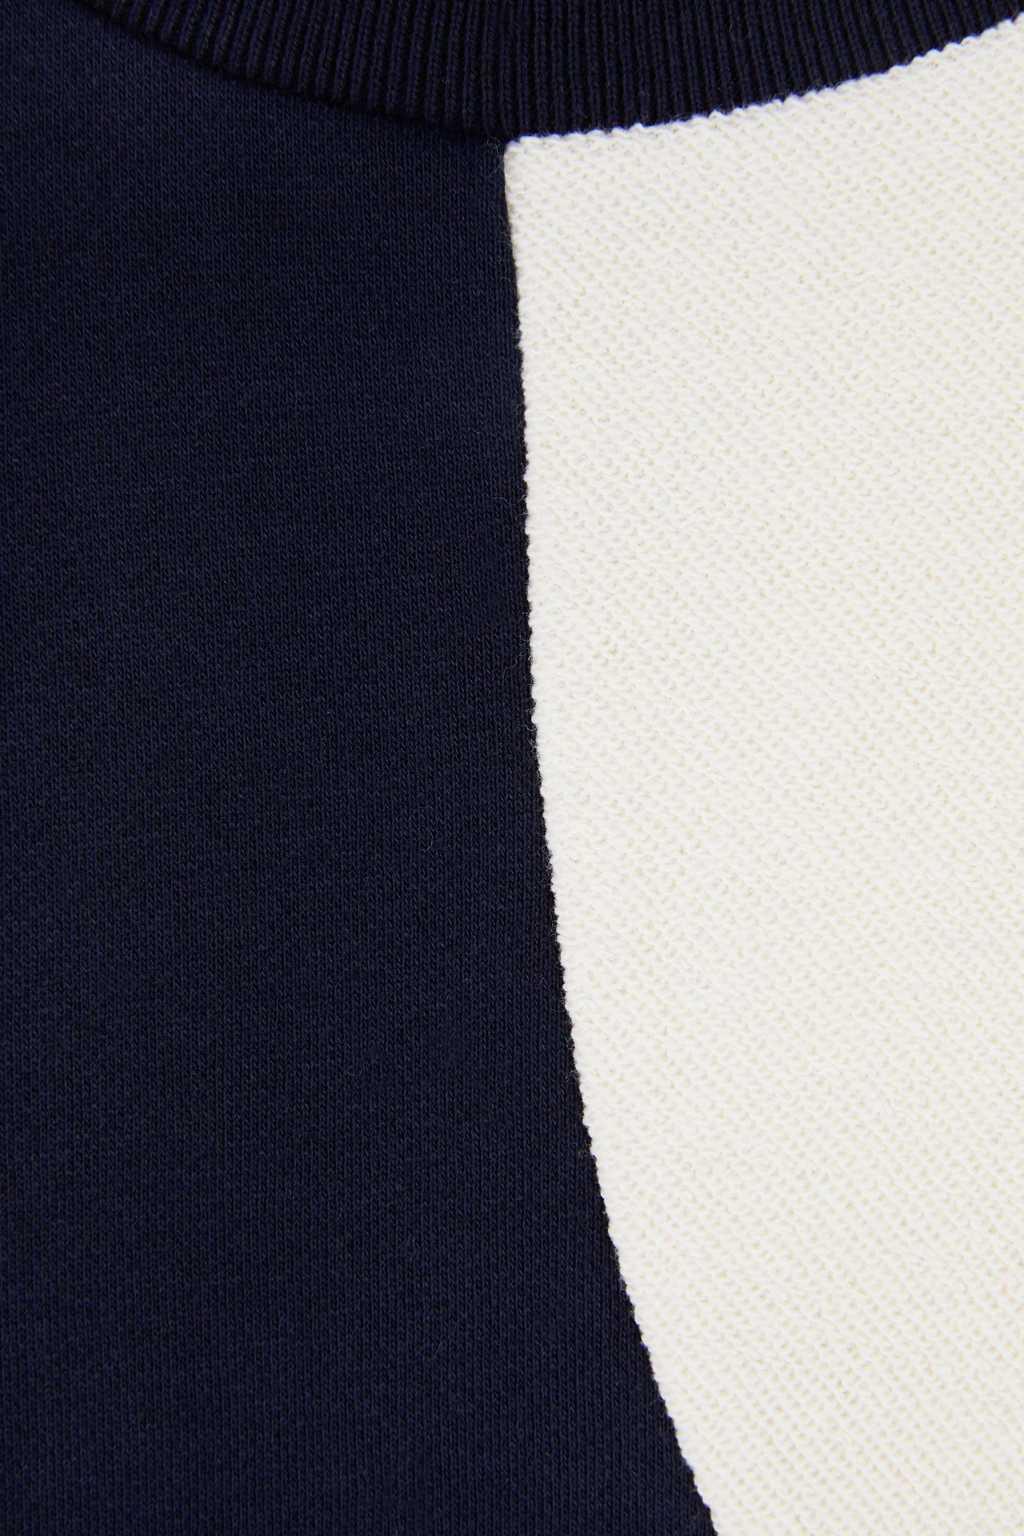 Sweatshirt 20122019 Cream 6